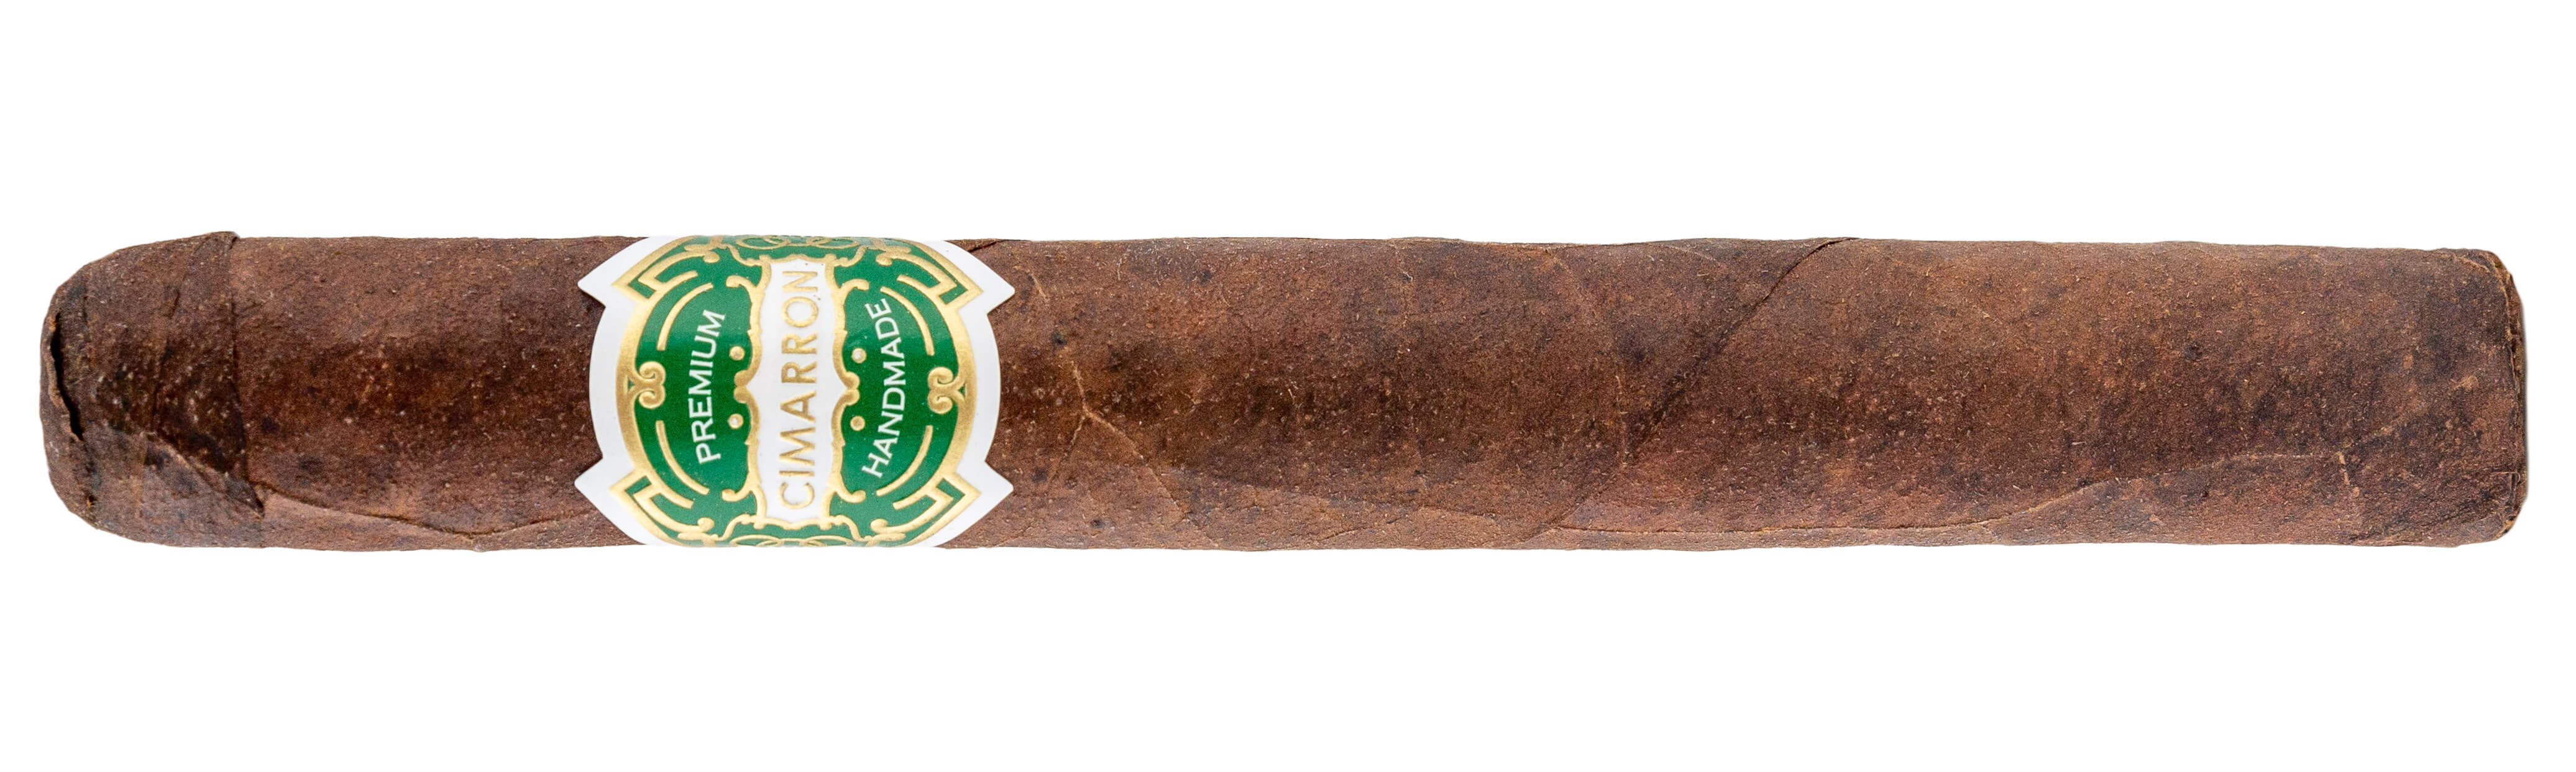 Blind Cigar Review: El Artista | Cimarron Maduro Toro